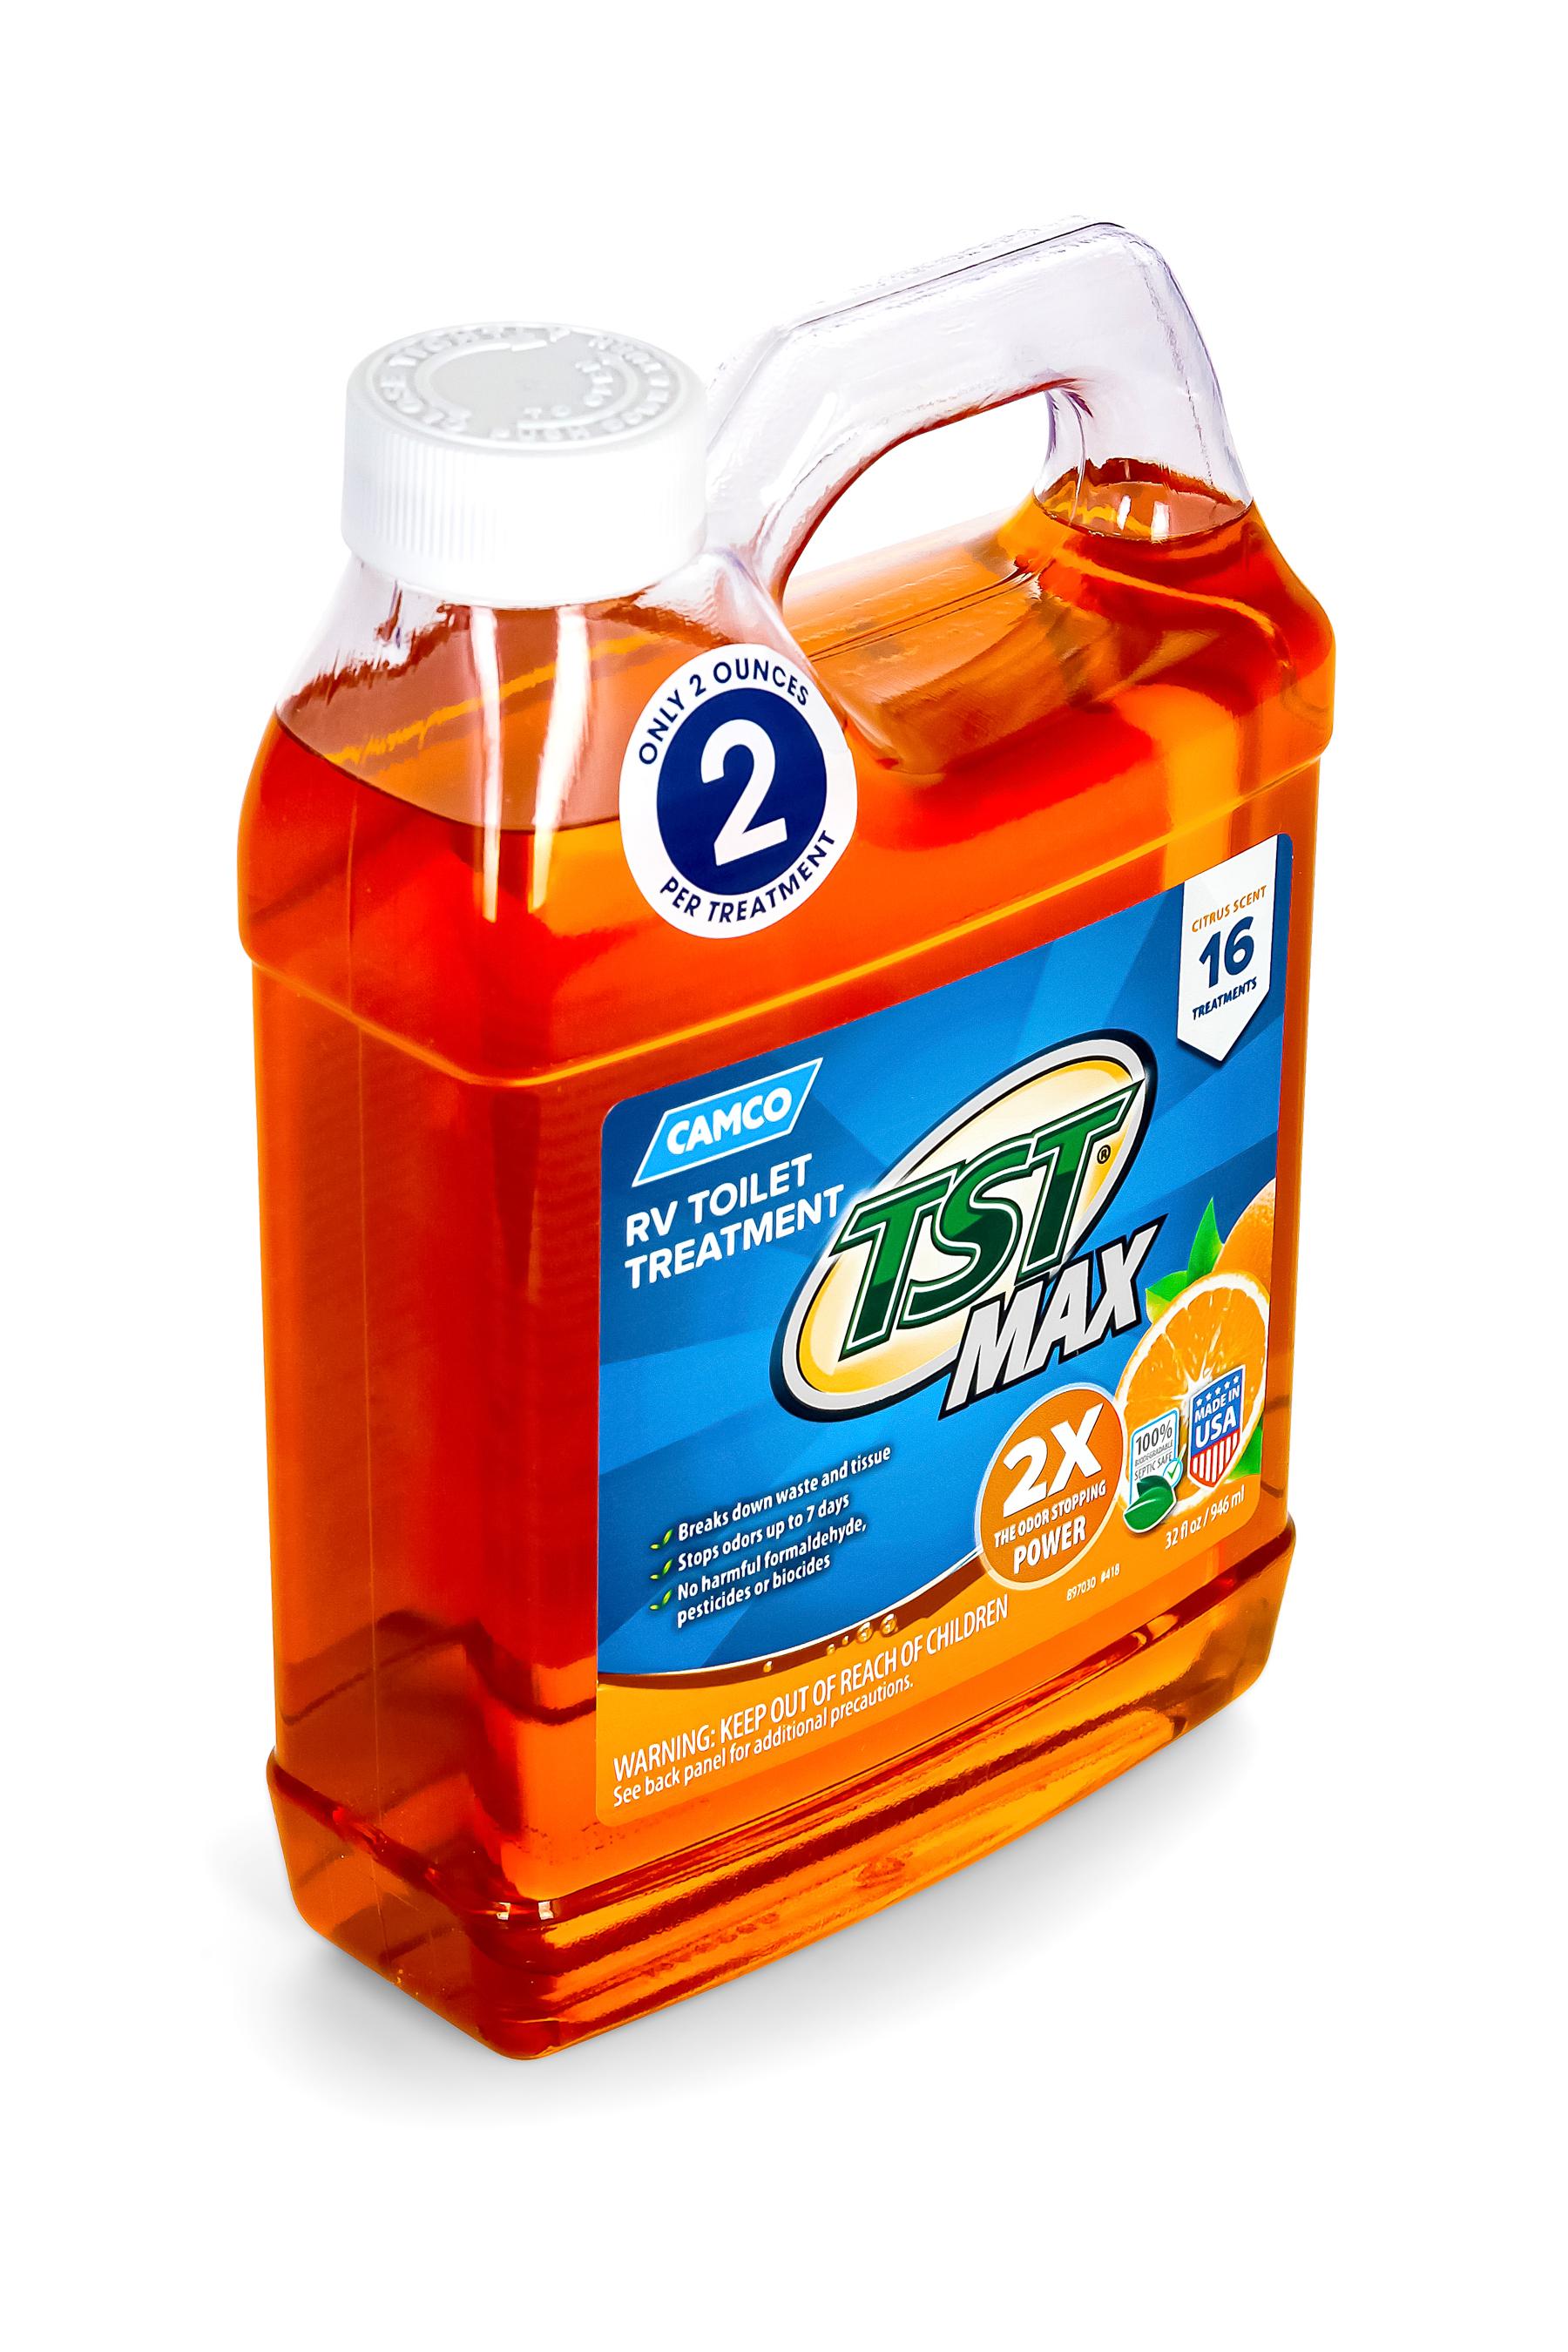 Camco Tst Max Strength Orange Scent Rv Toilet Treatment Formaldehyde Free Breaks Down Waste And Tissue Septic Tank Safe Treats 40 Gallon Holding Tanks 32 Oz 41192 Walmart Com Walmart Com